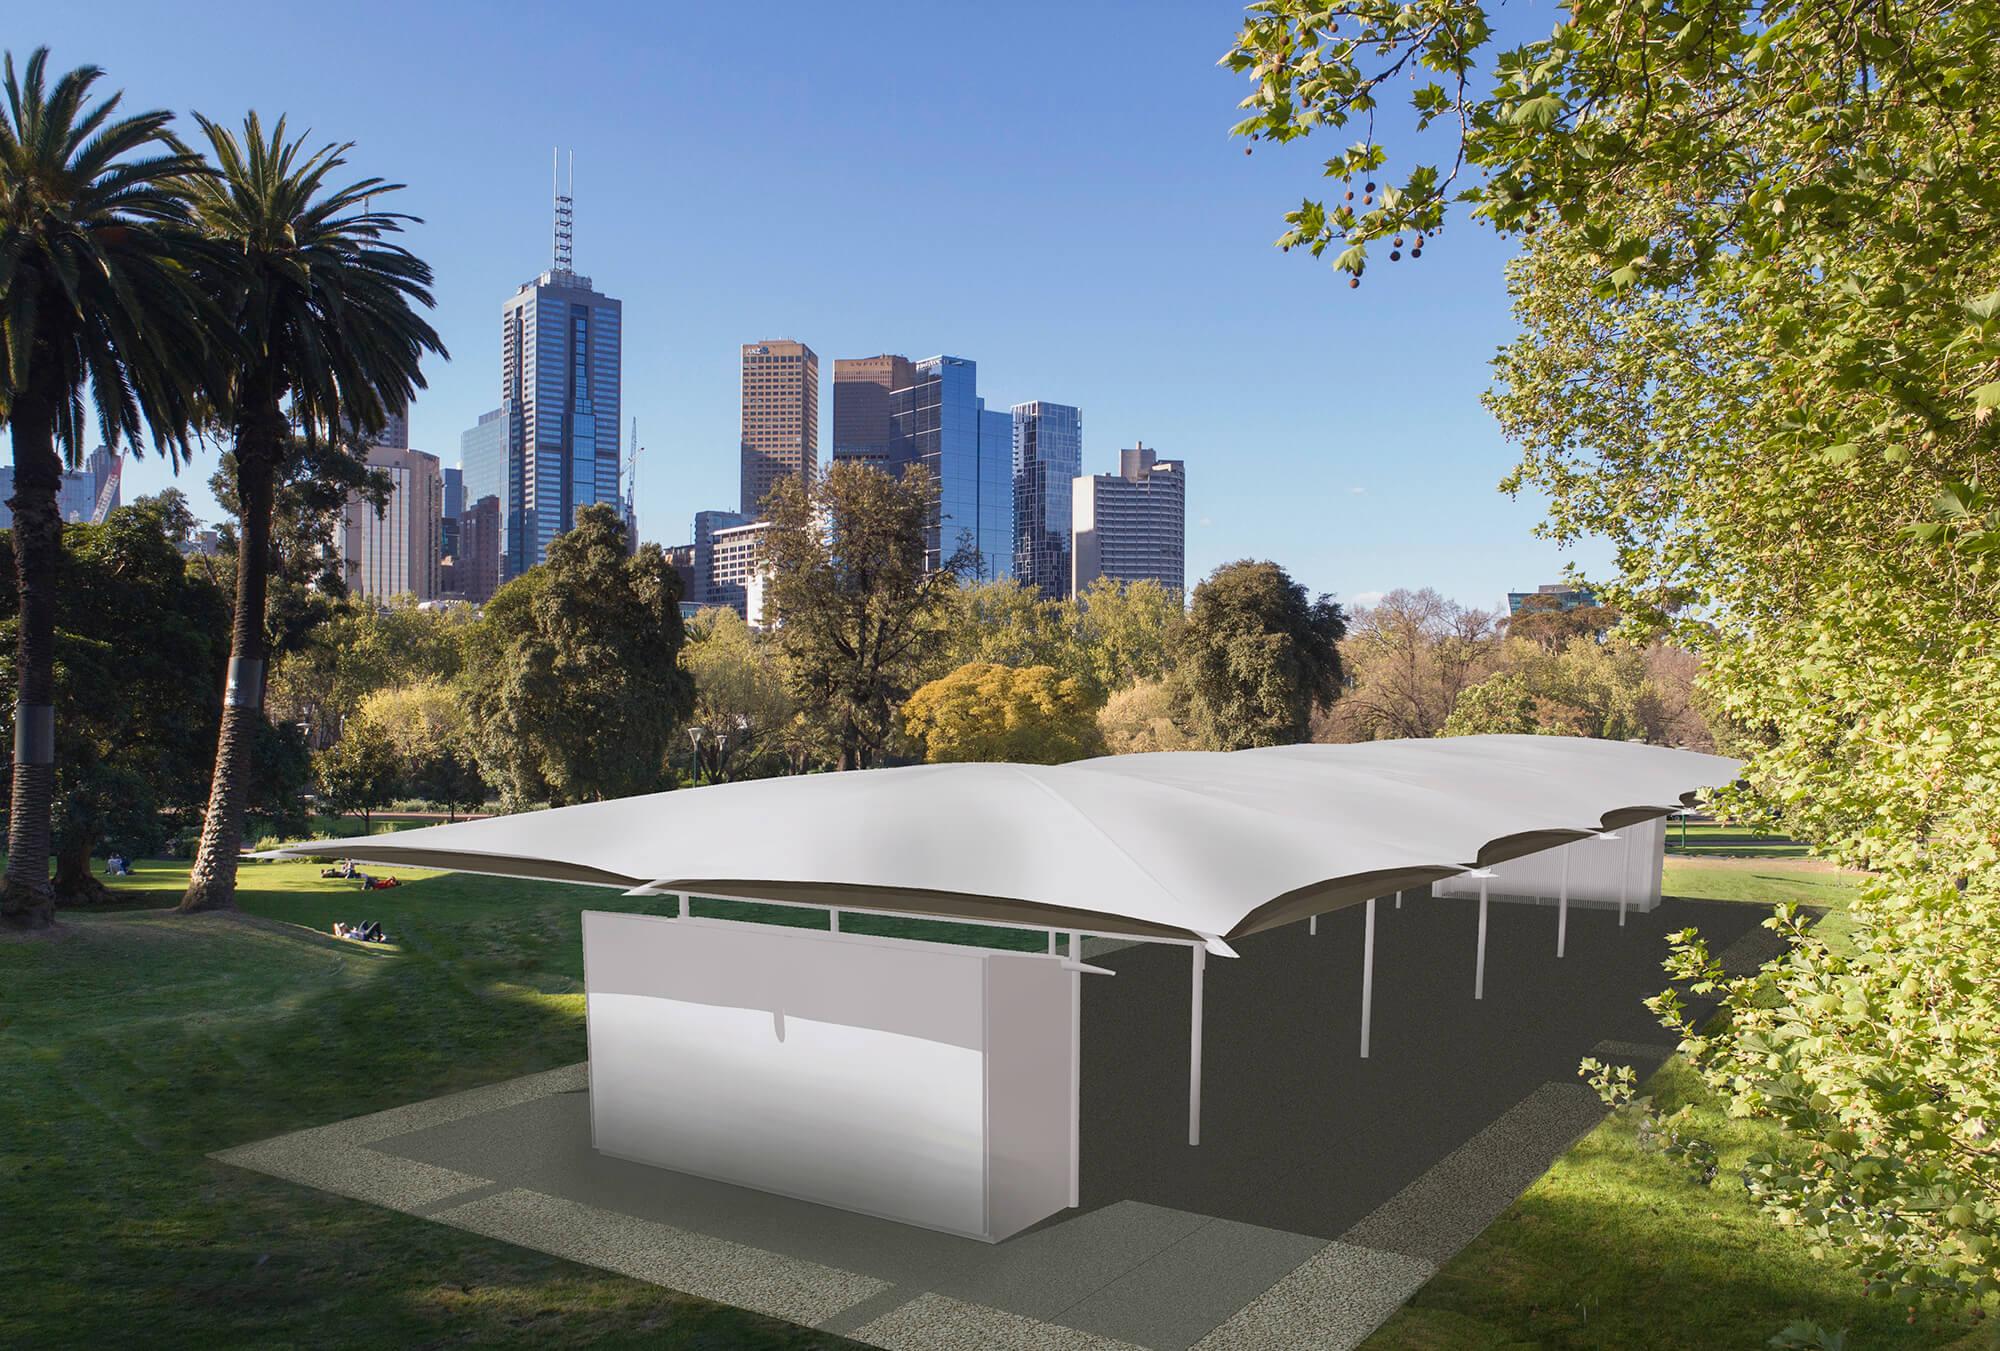 Big News! First look at Glenn Murcutt's MPavilion 2019 design